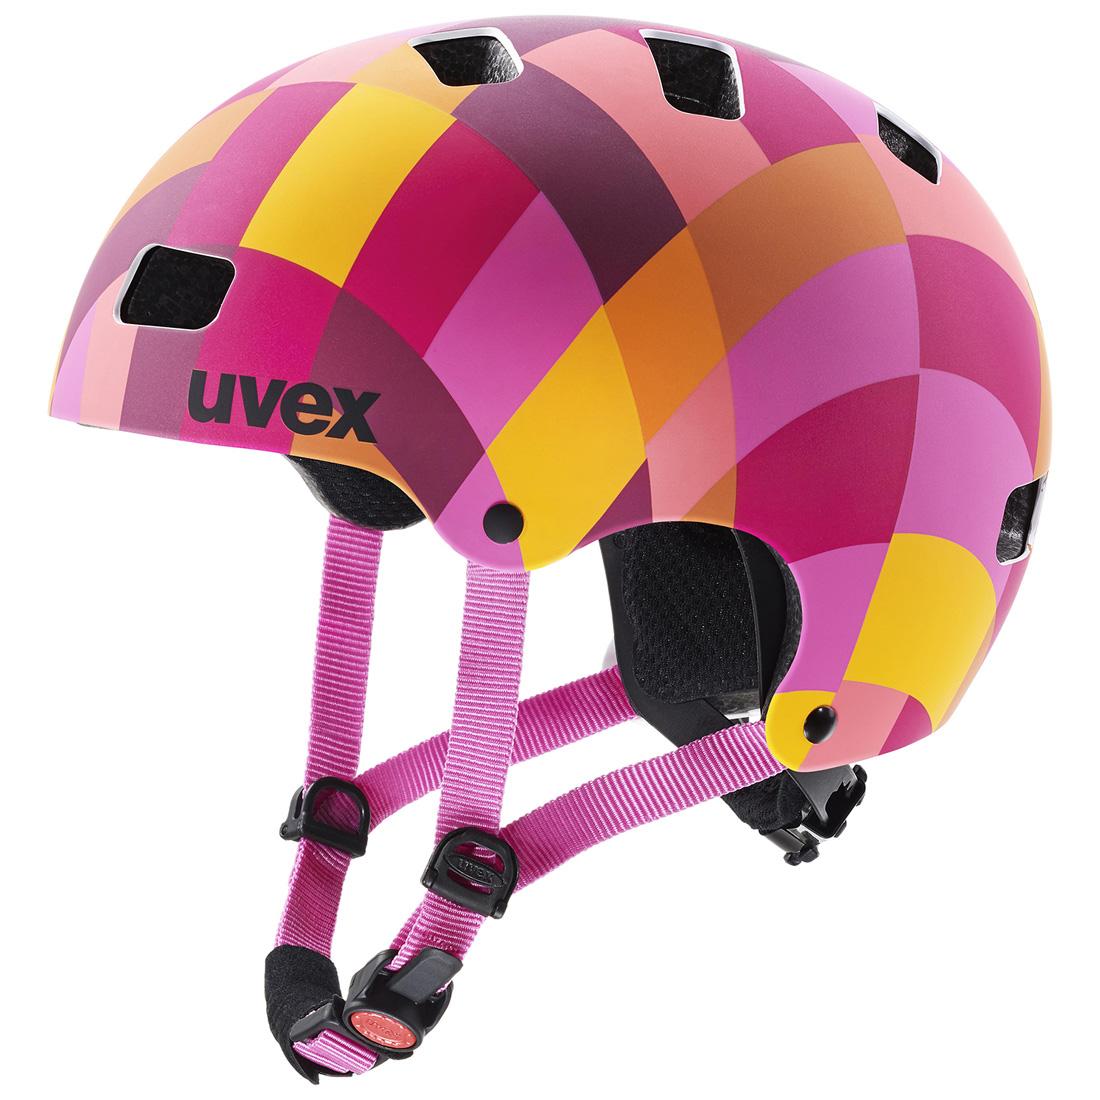 UVEX KID 3 CC RED CHECKERED 2020